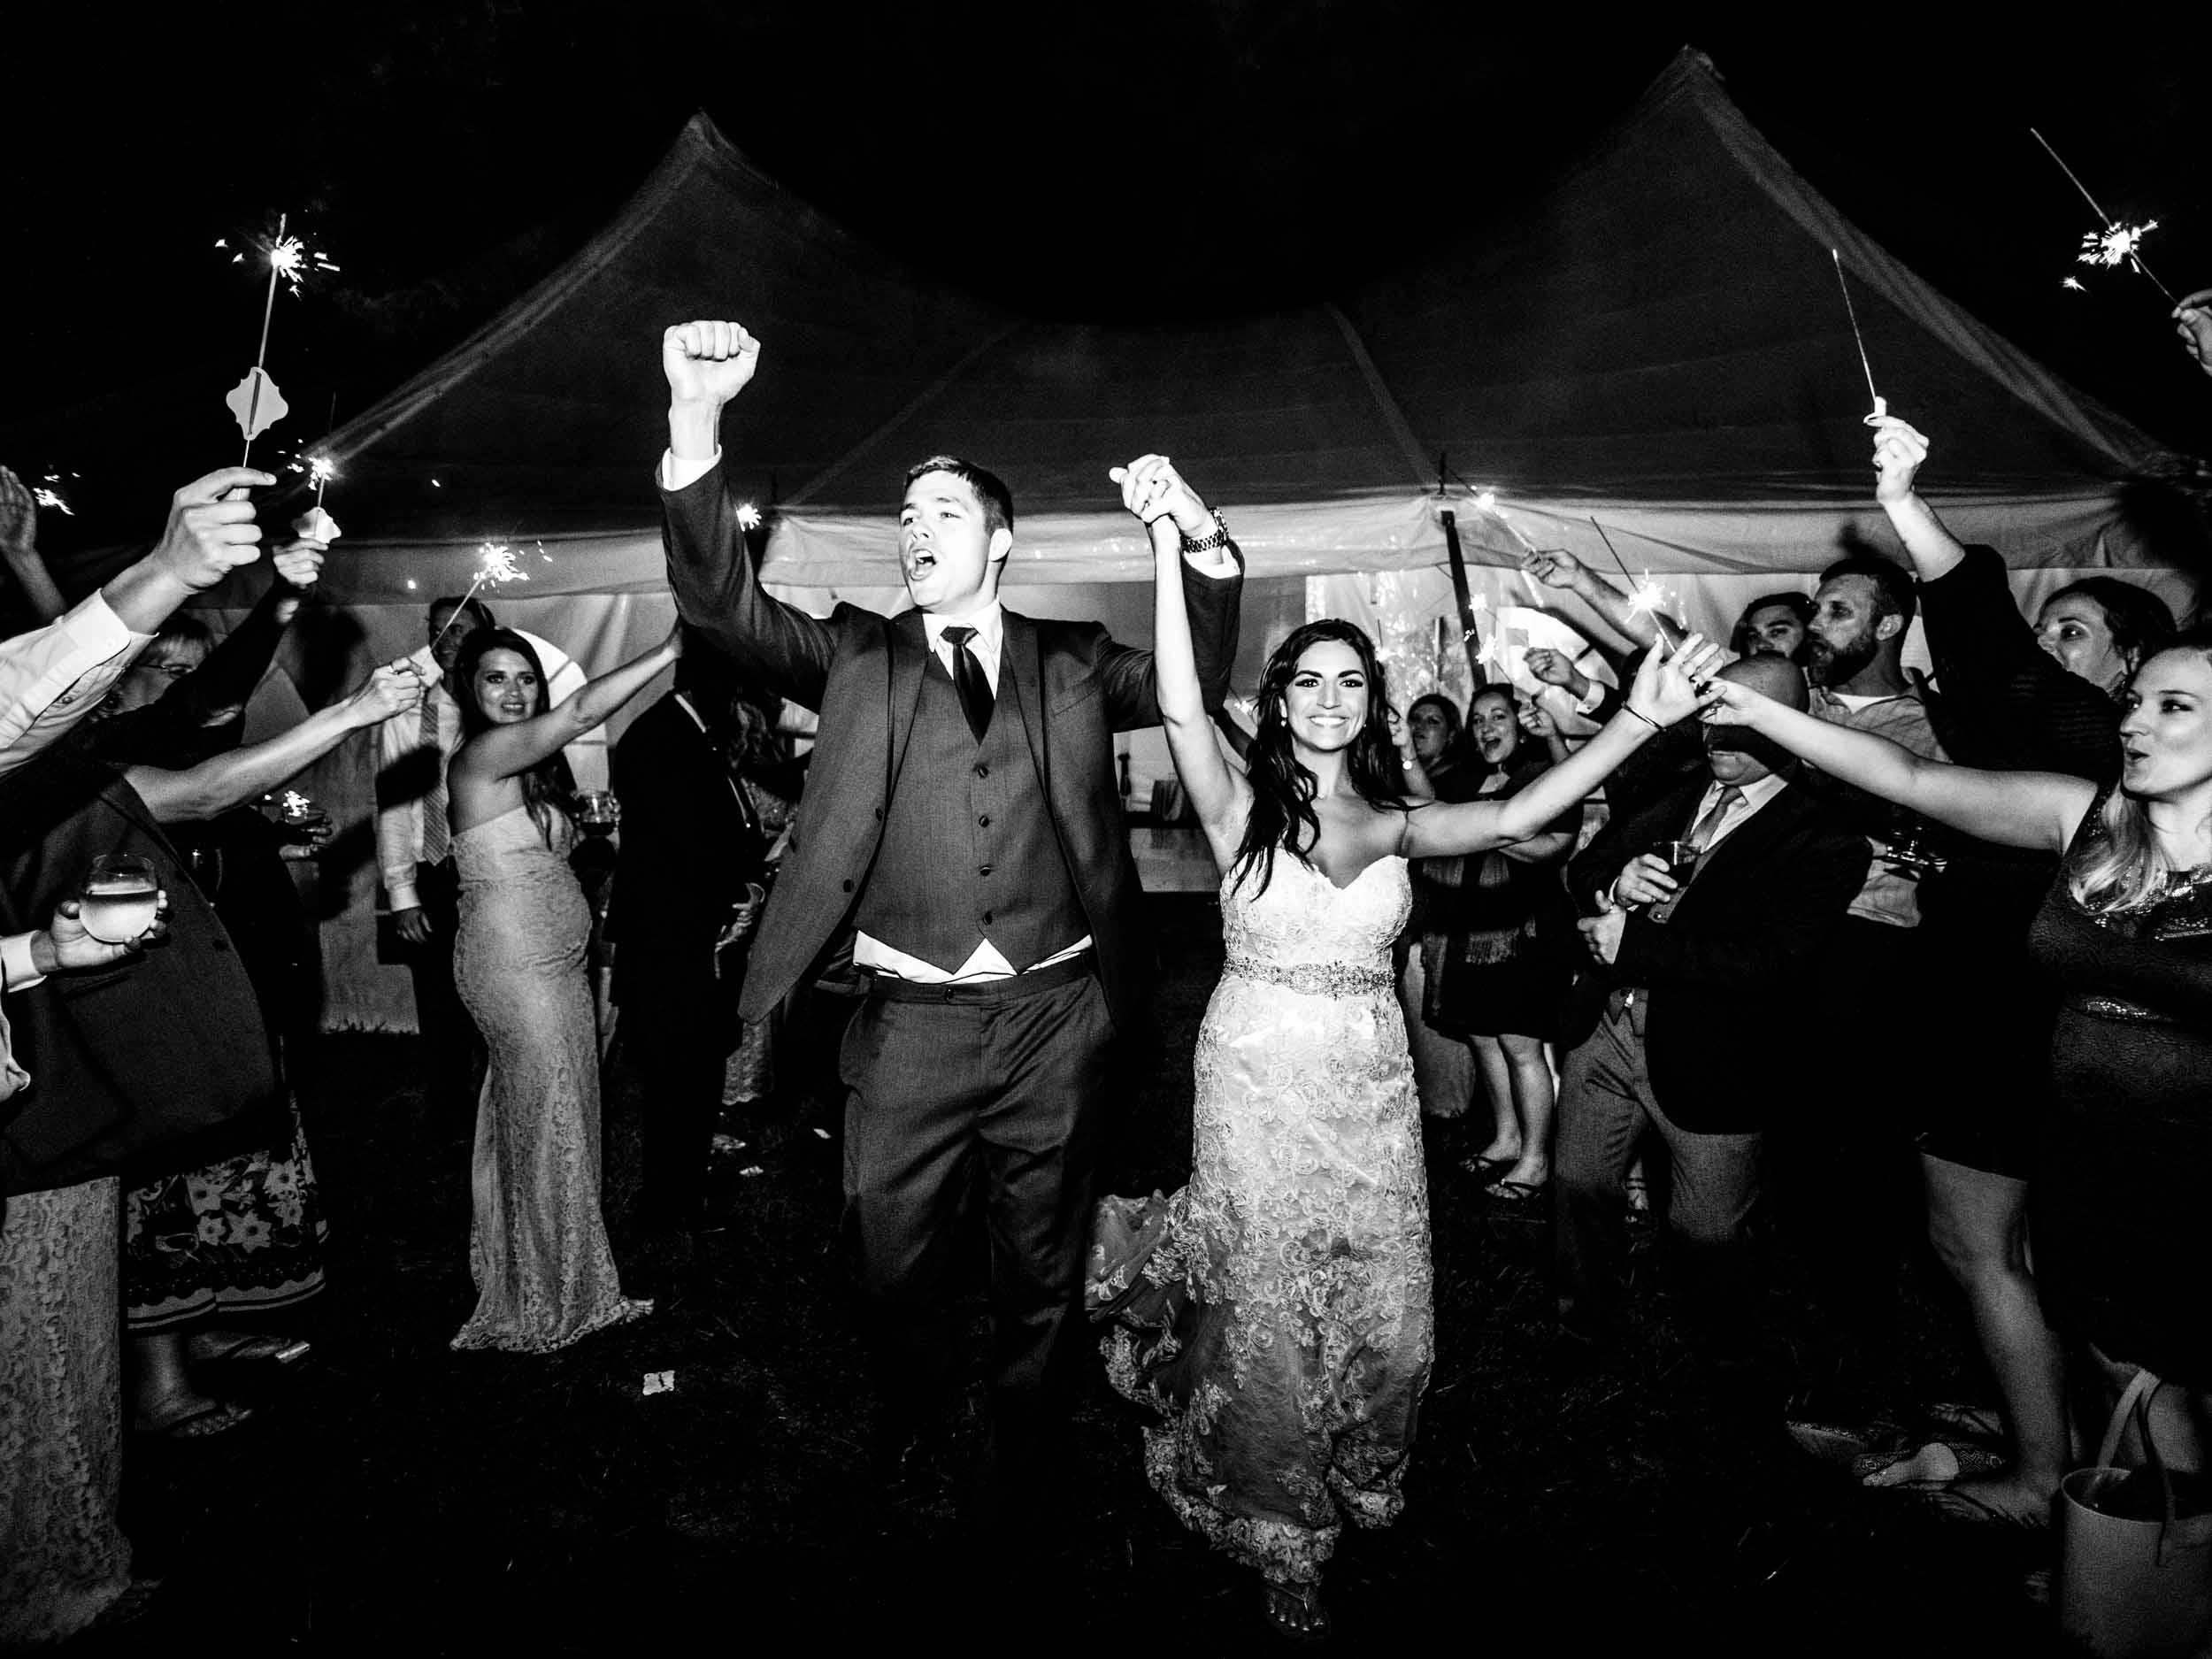 dc+metro+wedding+photographer+vadym+guliuk+photography+wedding+sparkler+exit-2020.jpg